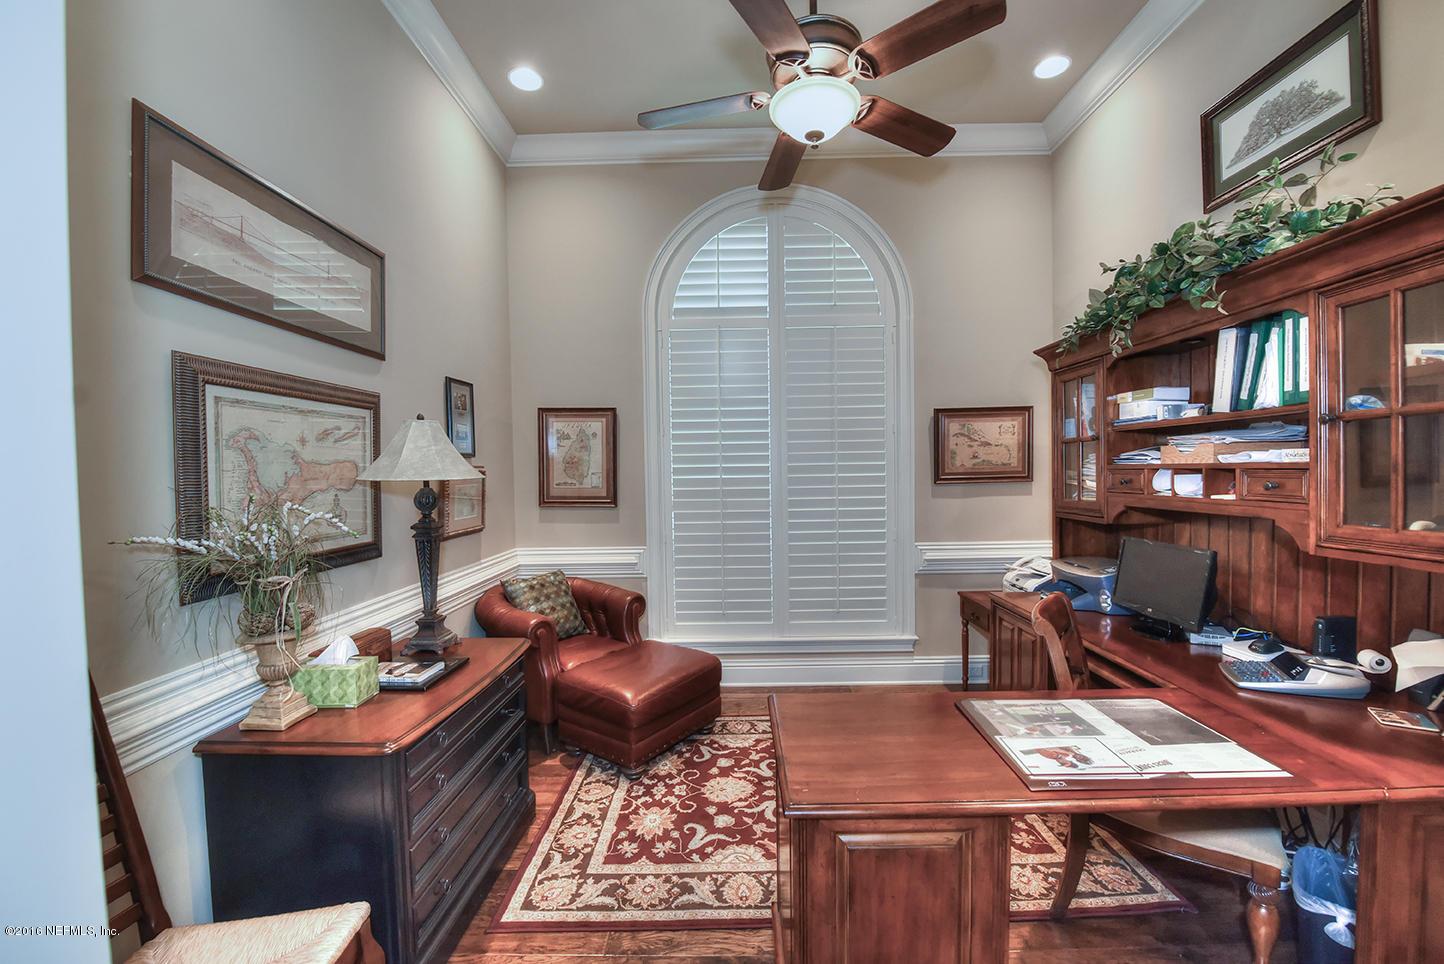 144 CORBATA, ST AUGUSTINE, FLORIDA 32095, 4 Bedrooms Bedrooms, ,4 BathroomsBathrooms,Residential - single family,For sale,CORBATA,925136